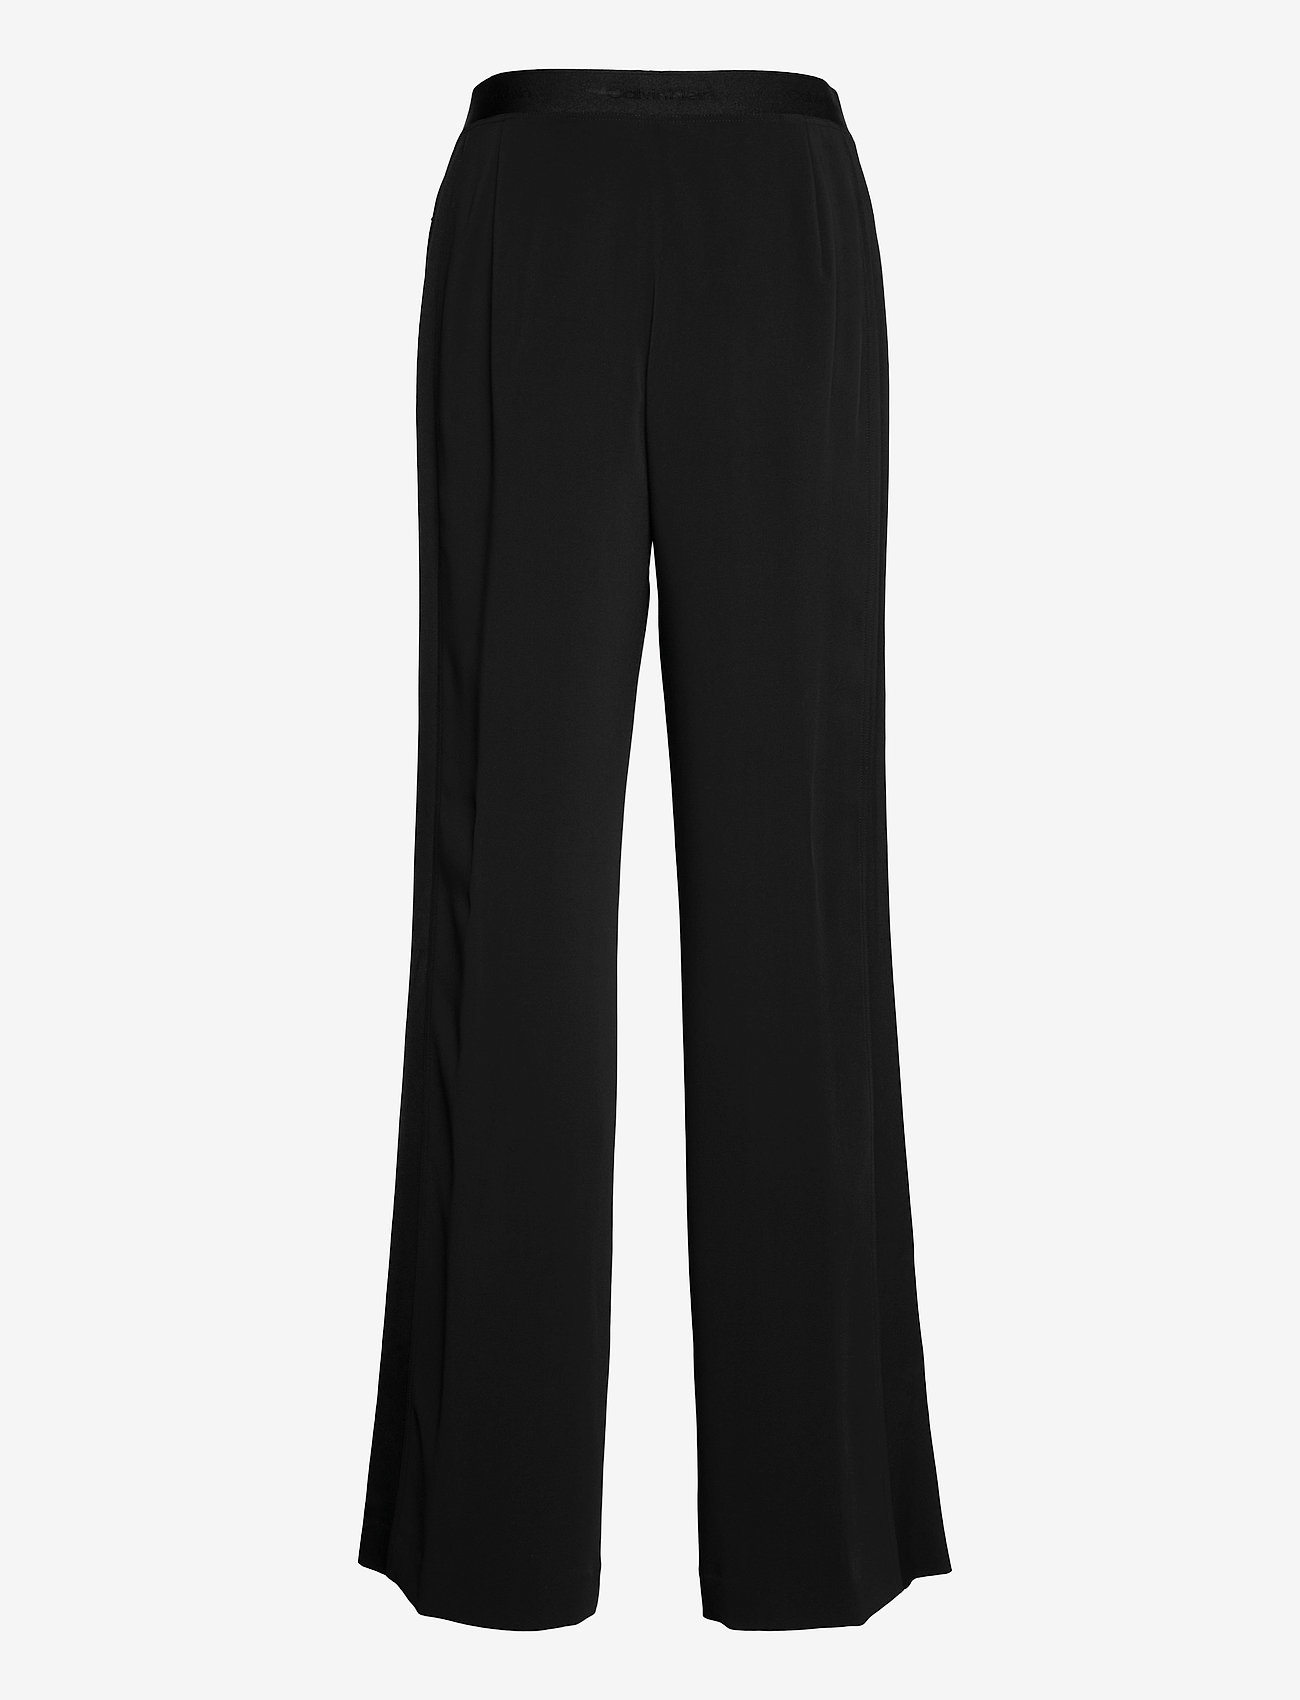 Calvin Klein - TRAVEL CREPE WIDE LEG PANT - bukser med brede ben - ck black - 1